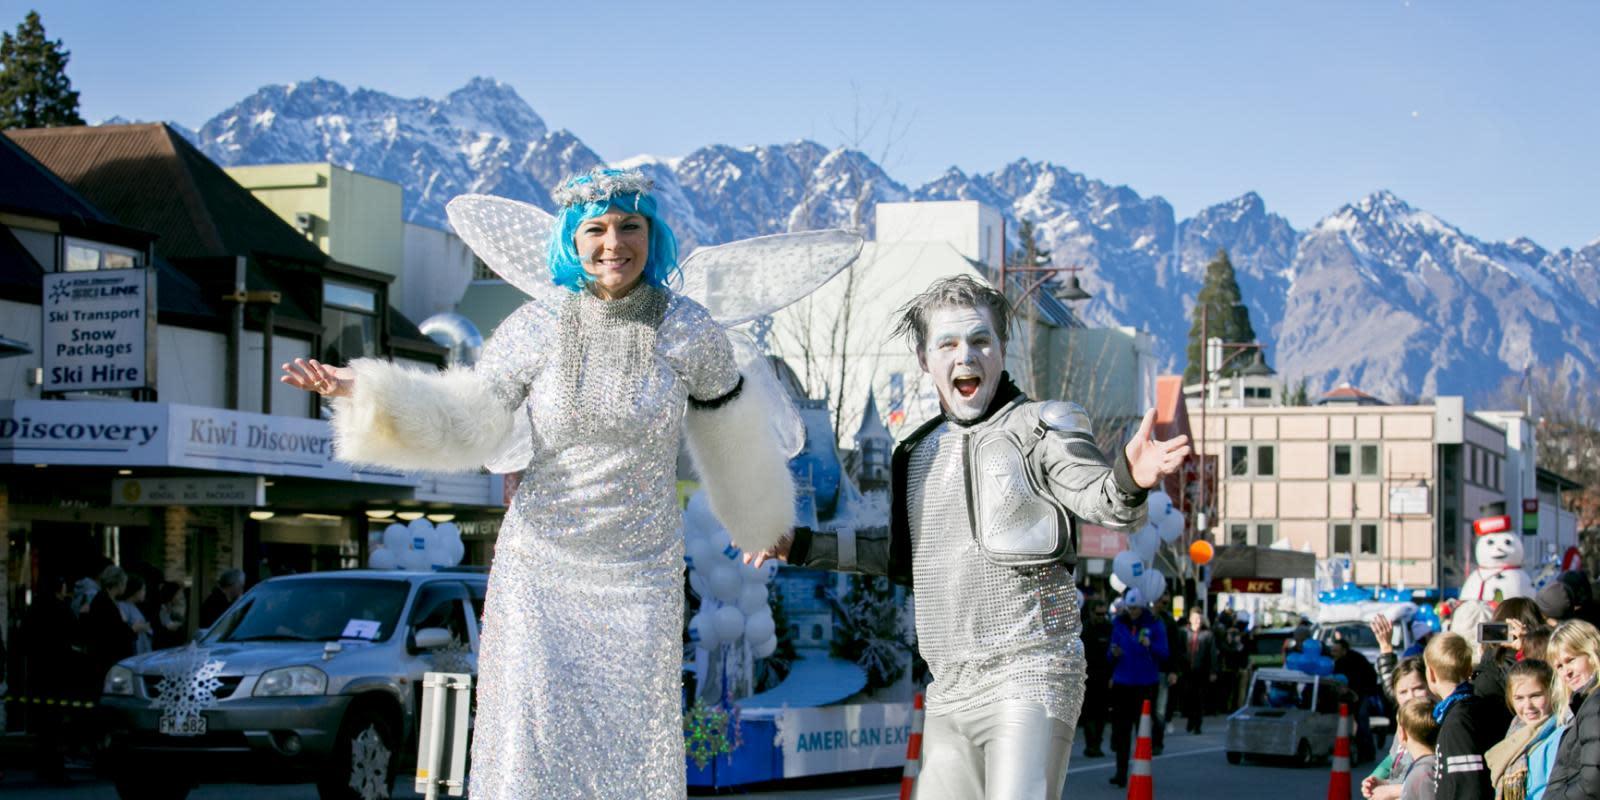 Street-Parade-Queenstown-Winter-Festival-2016